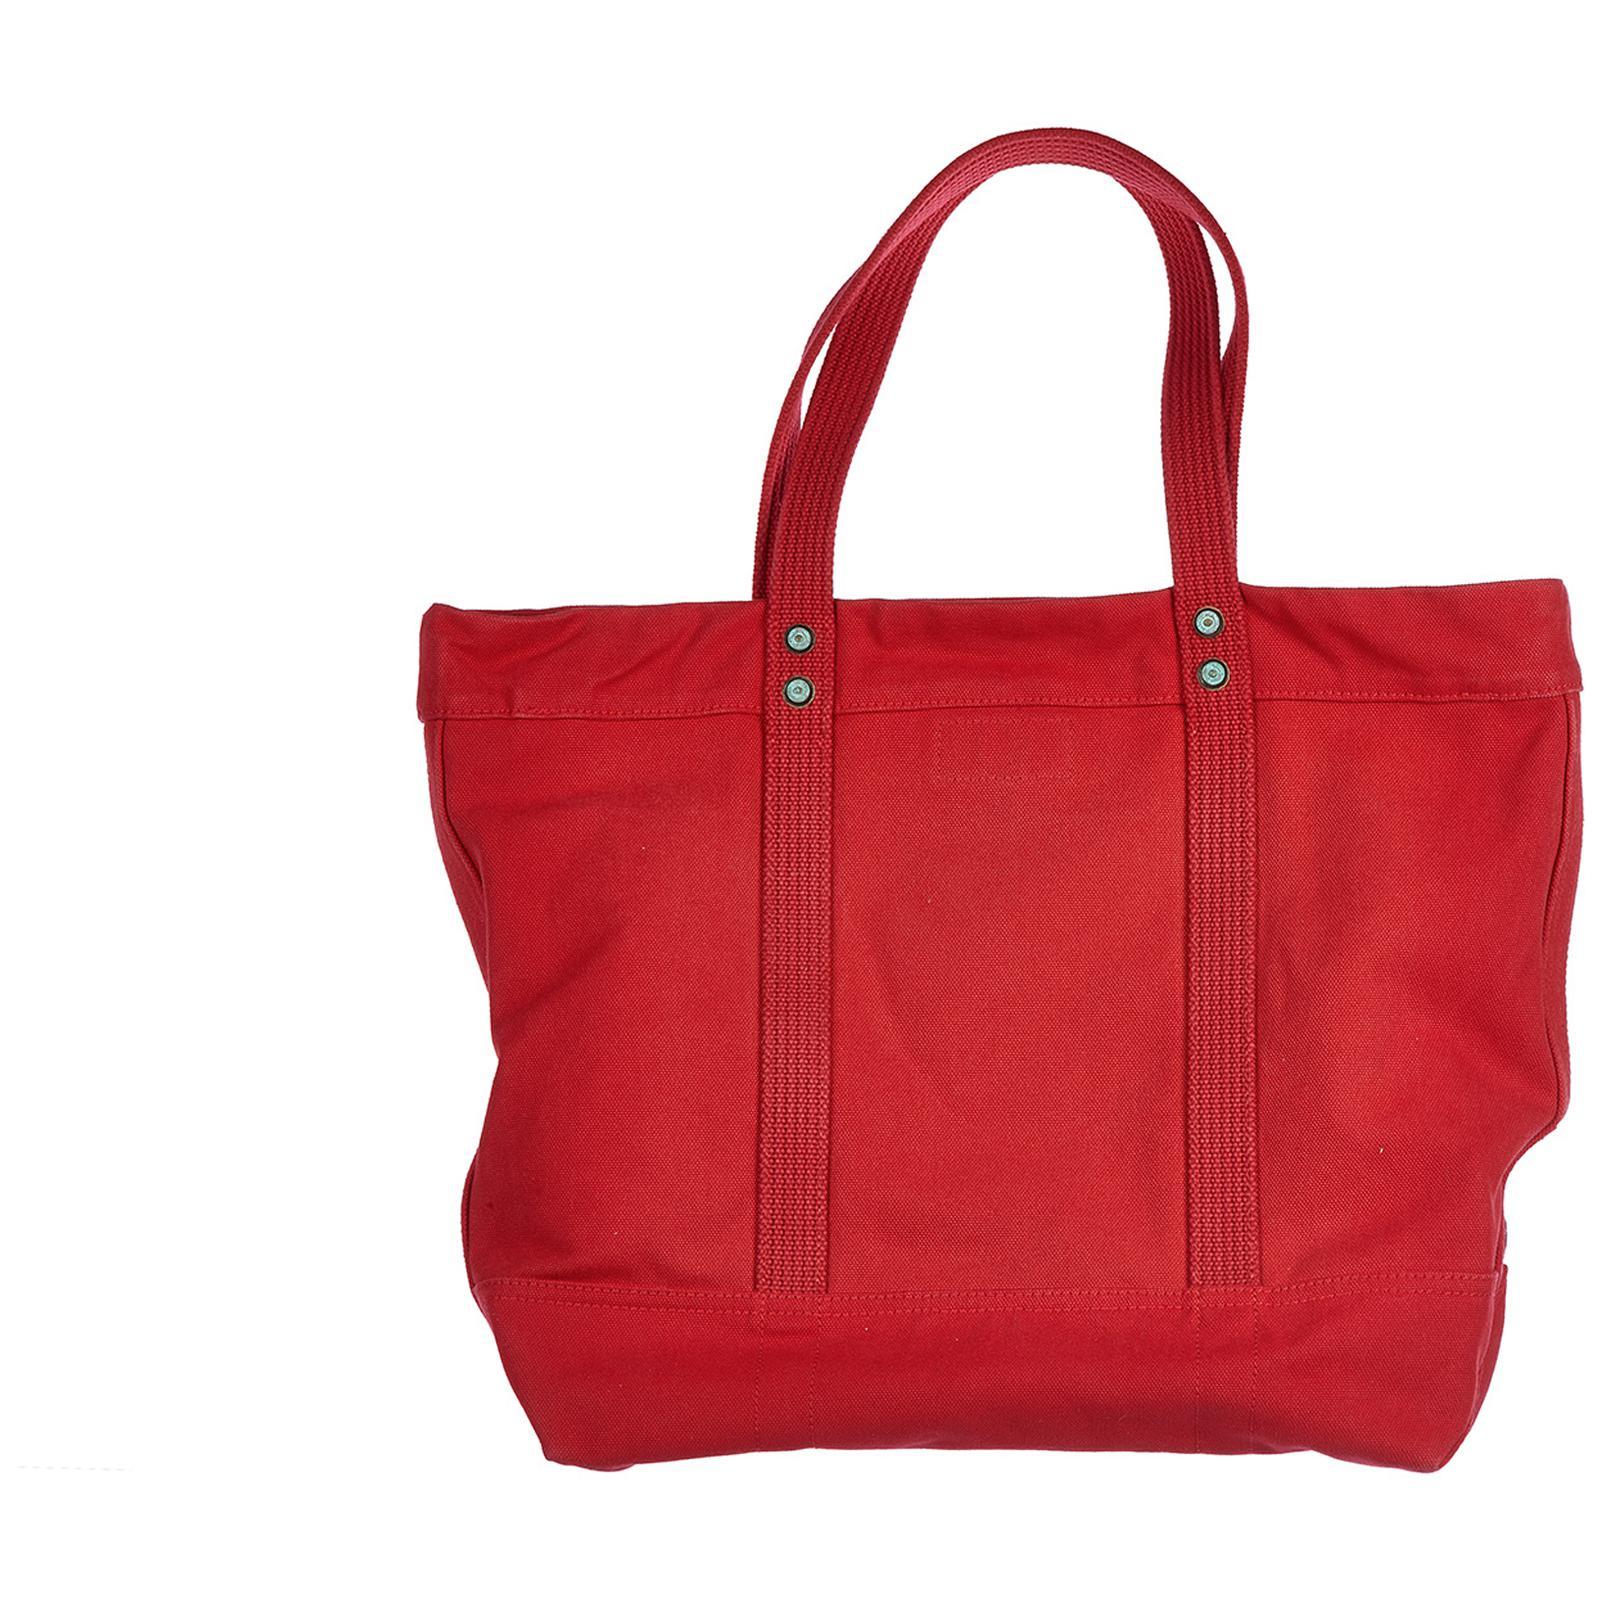 5611601953 Polo Ralph Lauren - Red Bag Handbag Shopping Tote Canvas for Men - Lyst.  View fullscreen